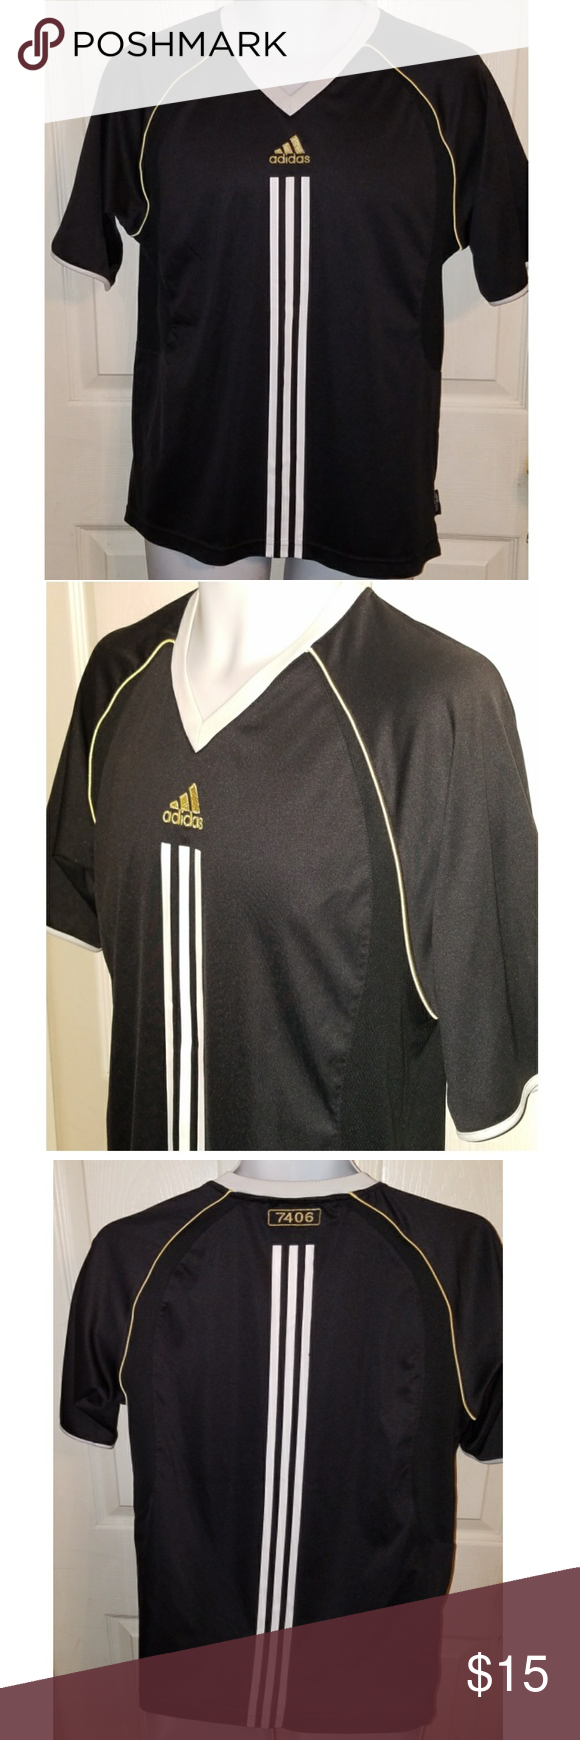 adidas 7406. Adidas 7406 Soccer Jersey Adult Small